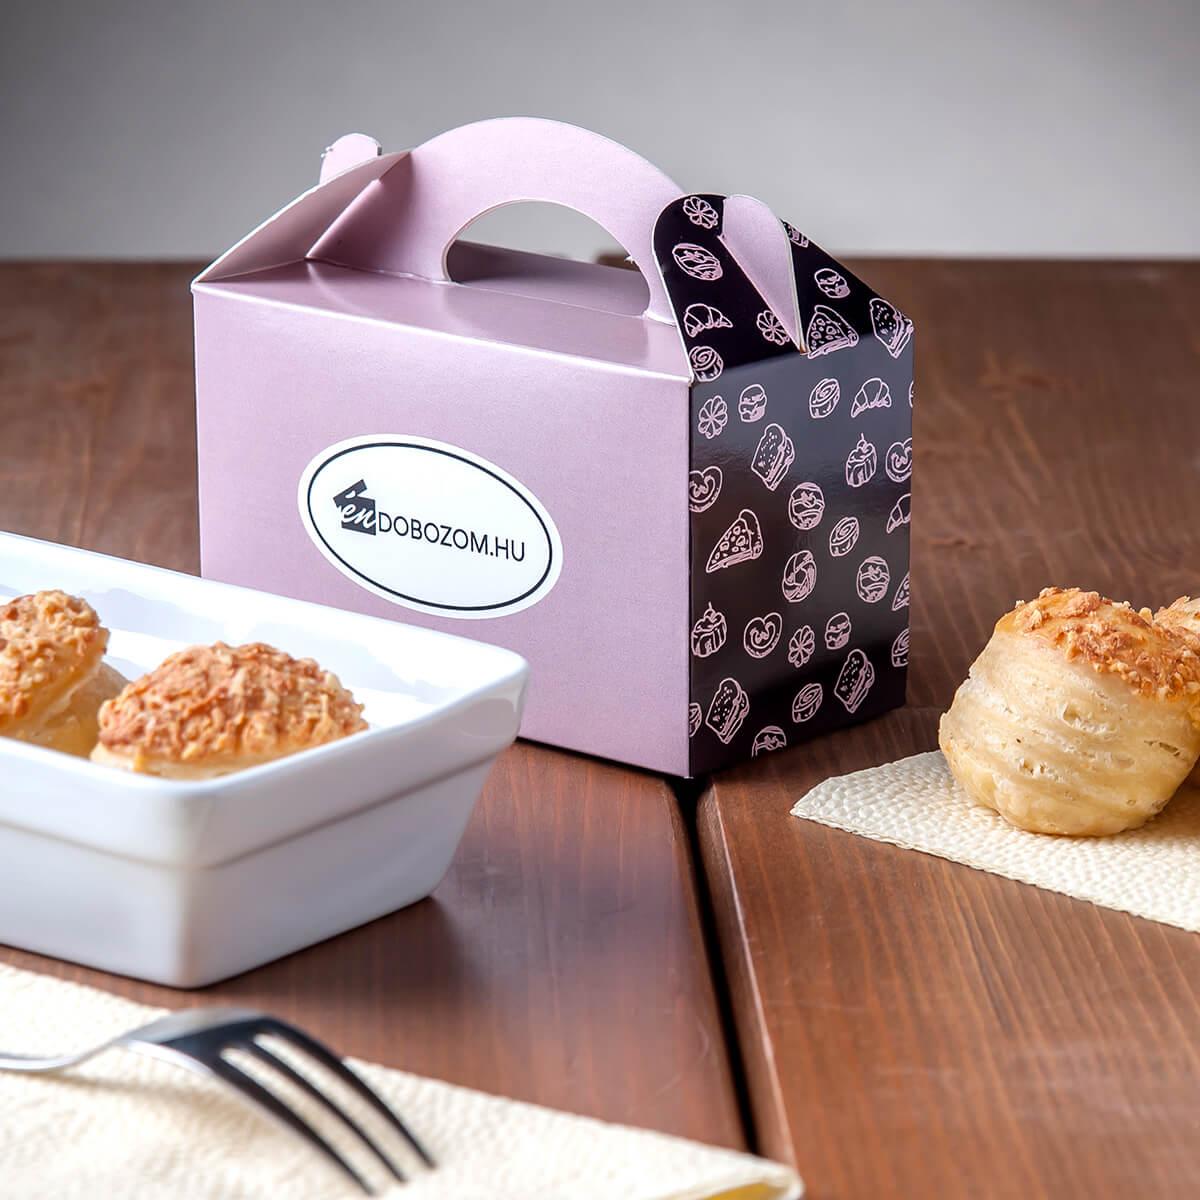 piskótafüles doboz sós süteménnyel